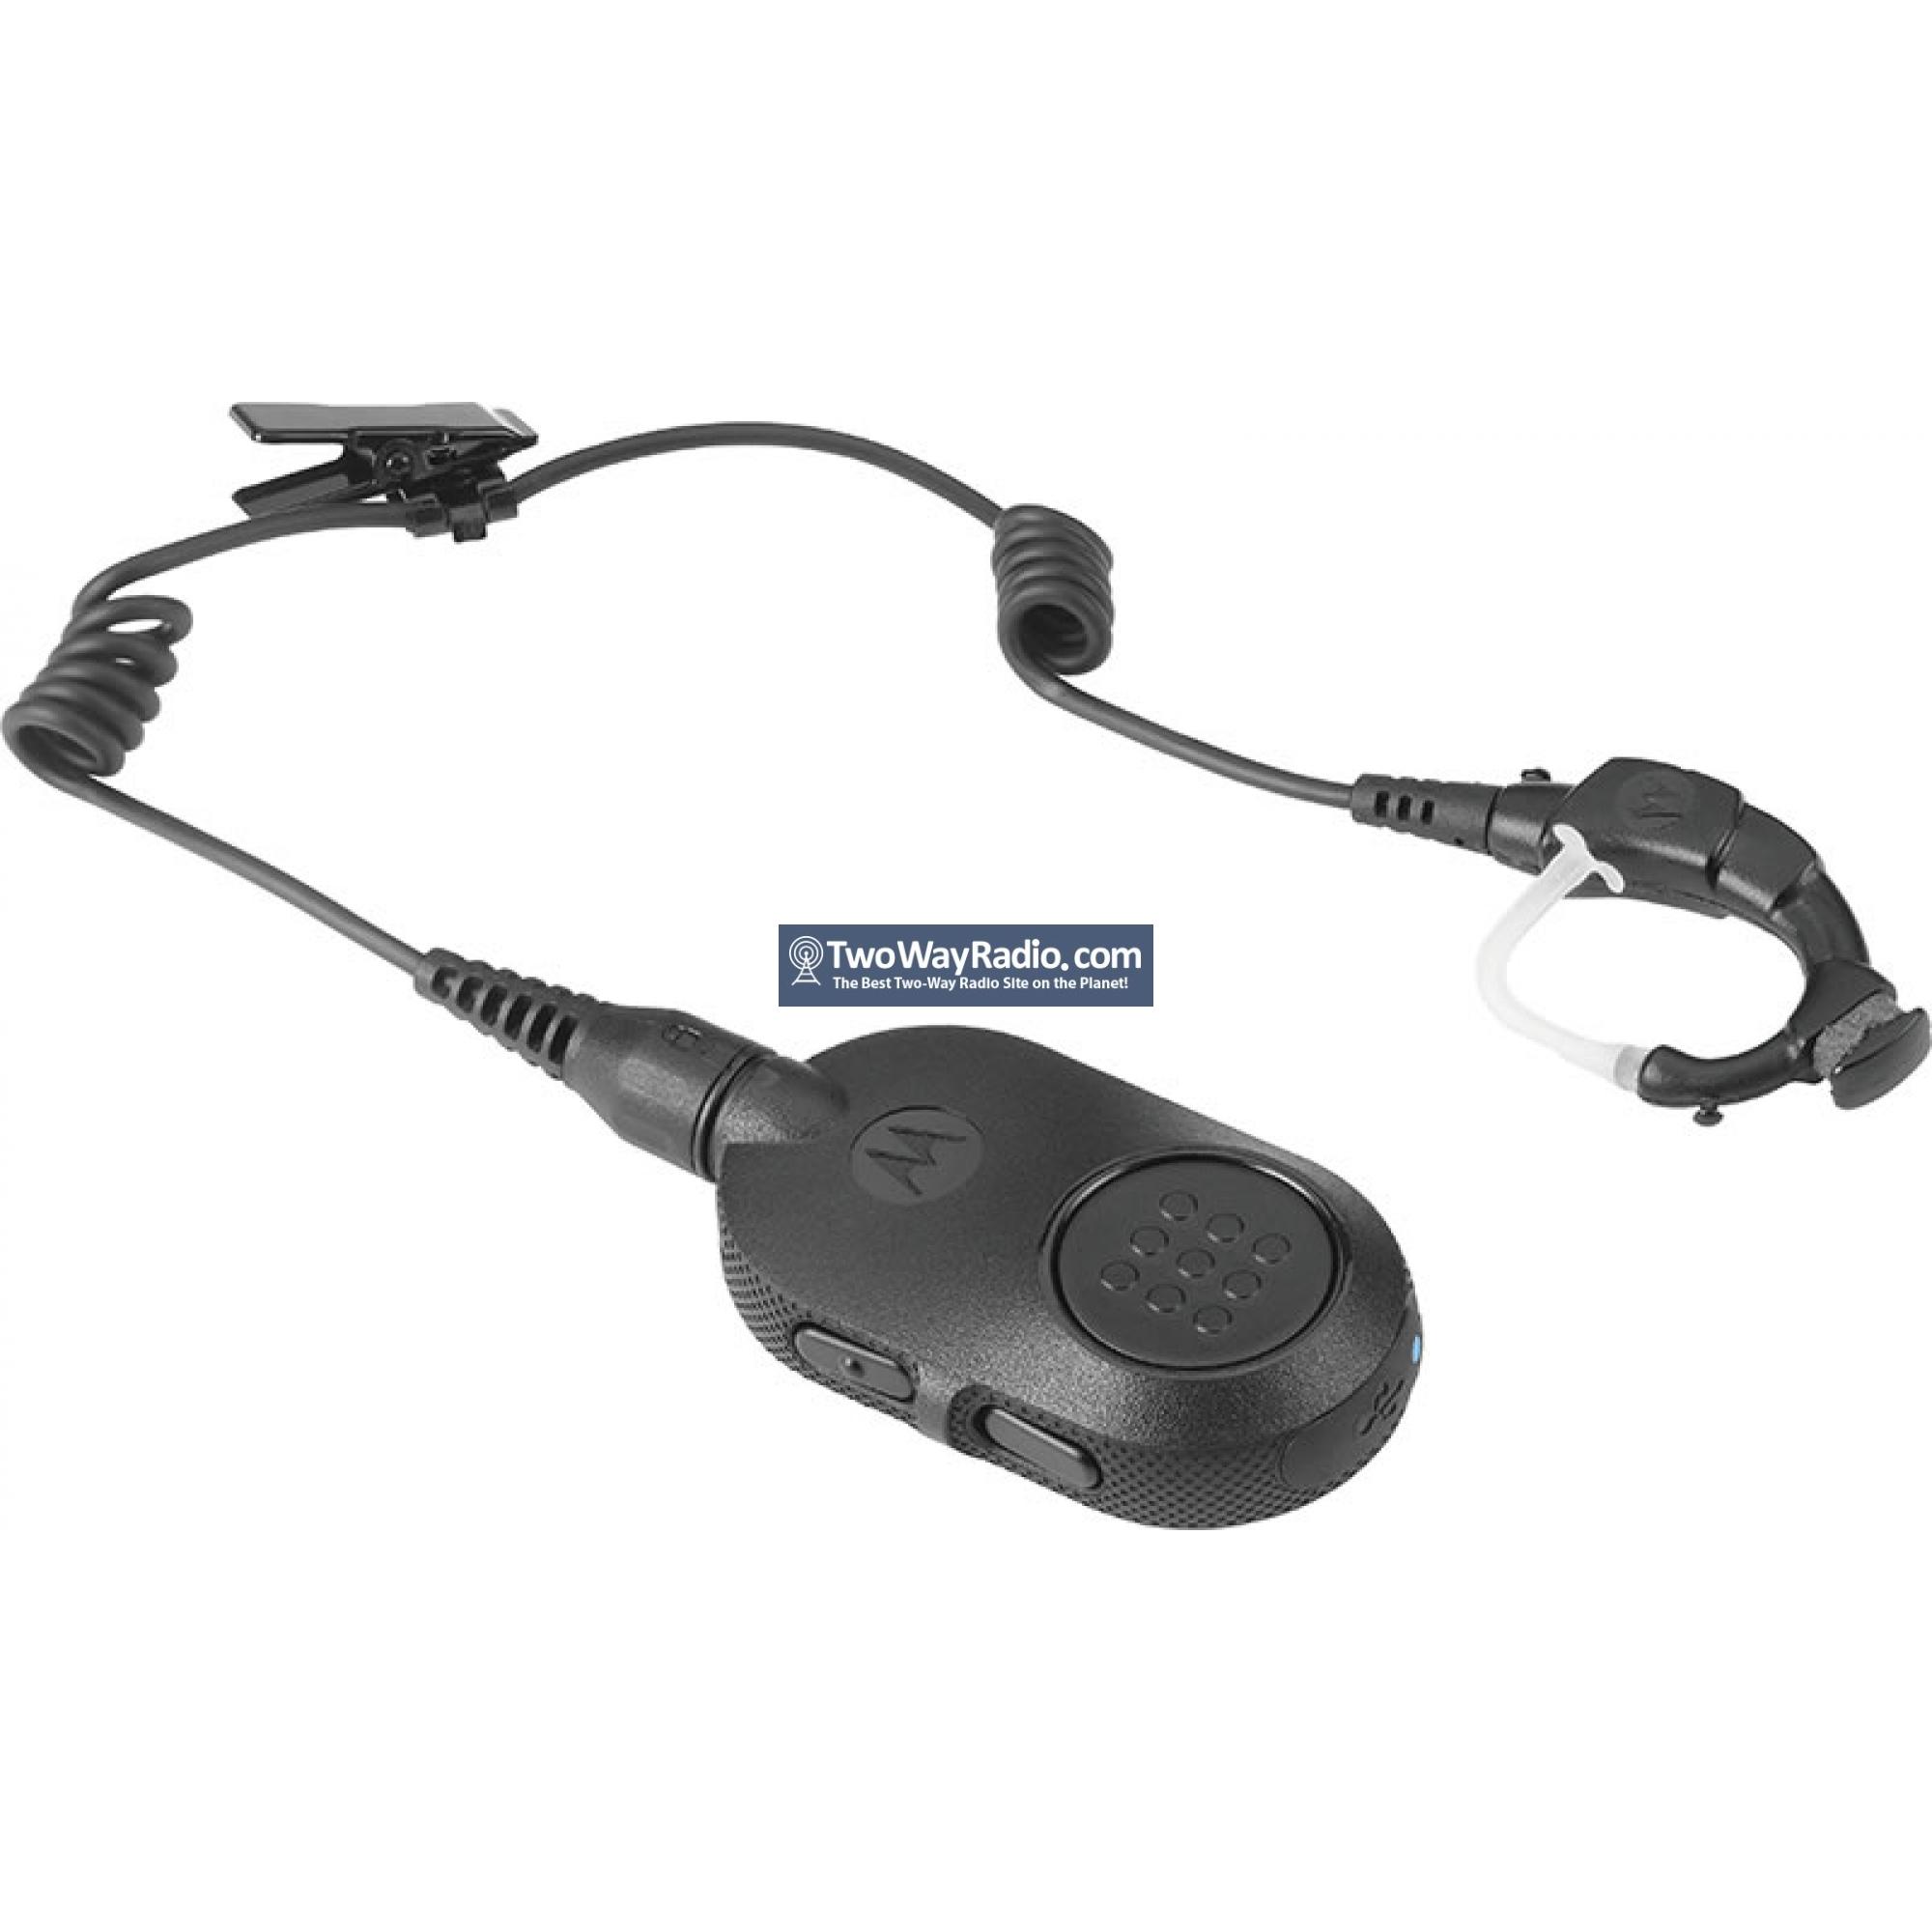 Buy Here | Motorola NNTN8125C Operations Critical Wireless